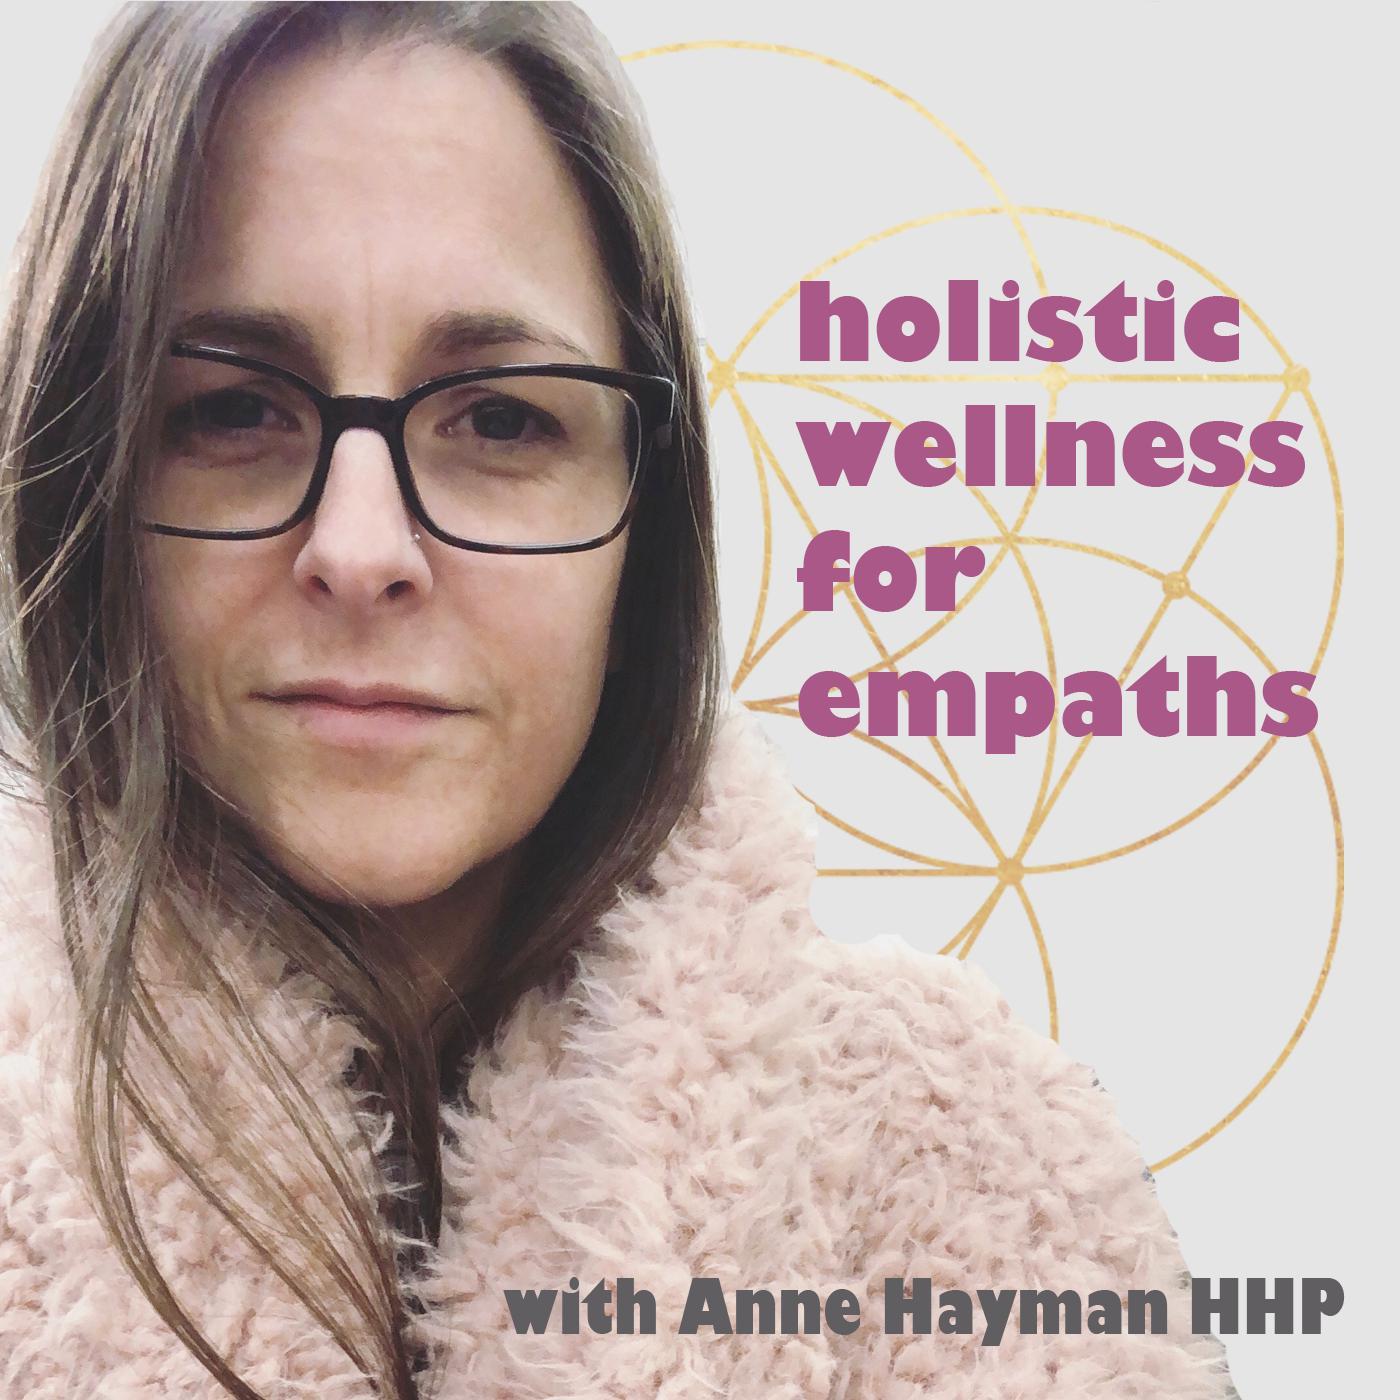 Holistic Wellness for Empaths (podcast) - Anne Hayman